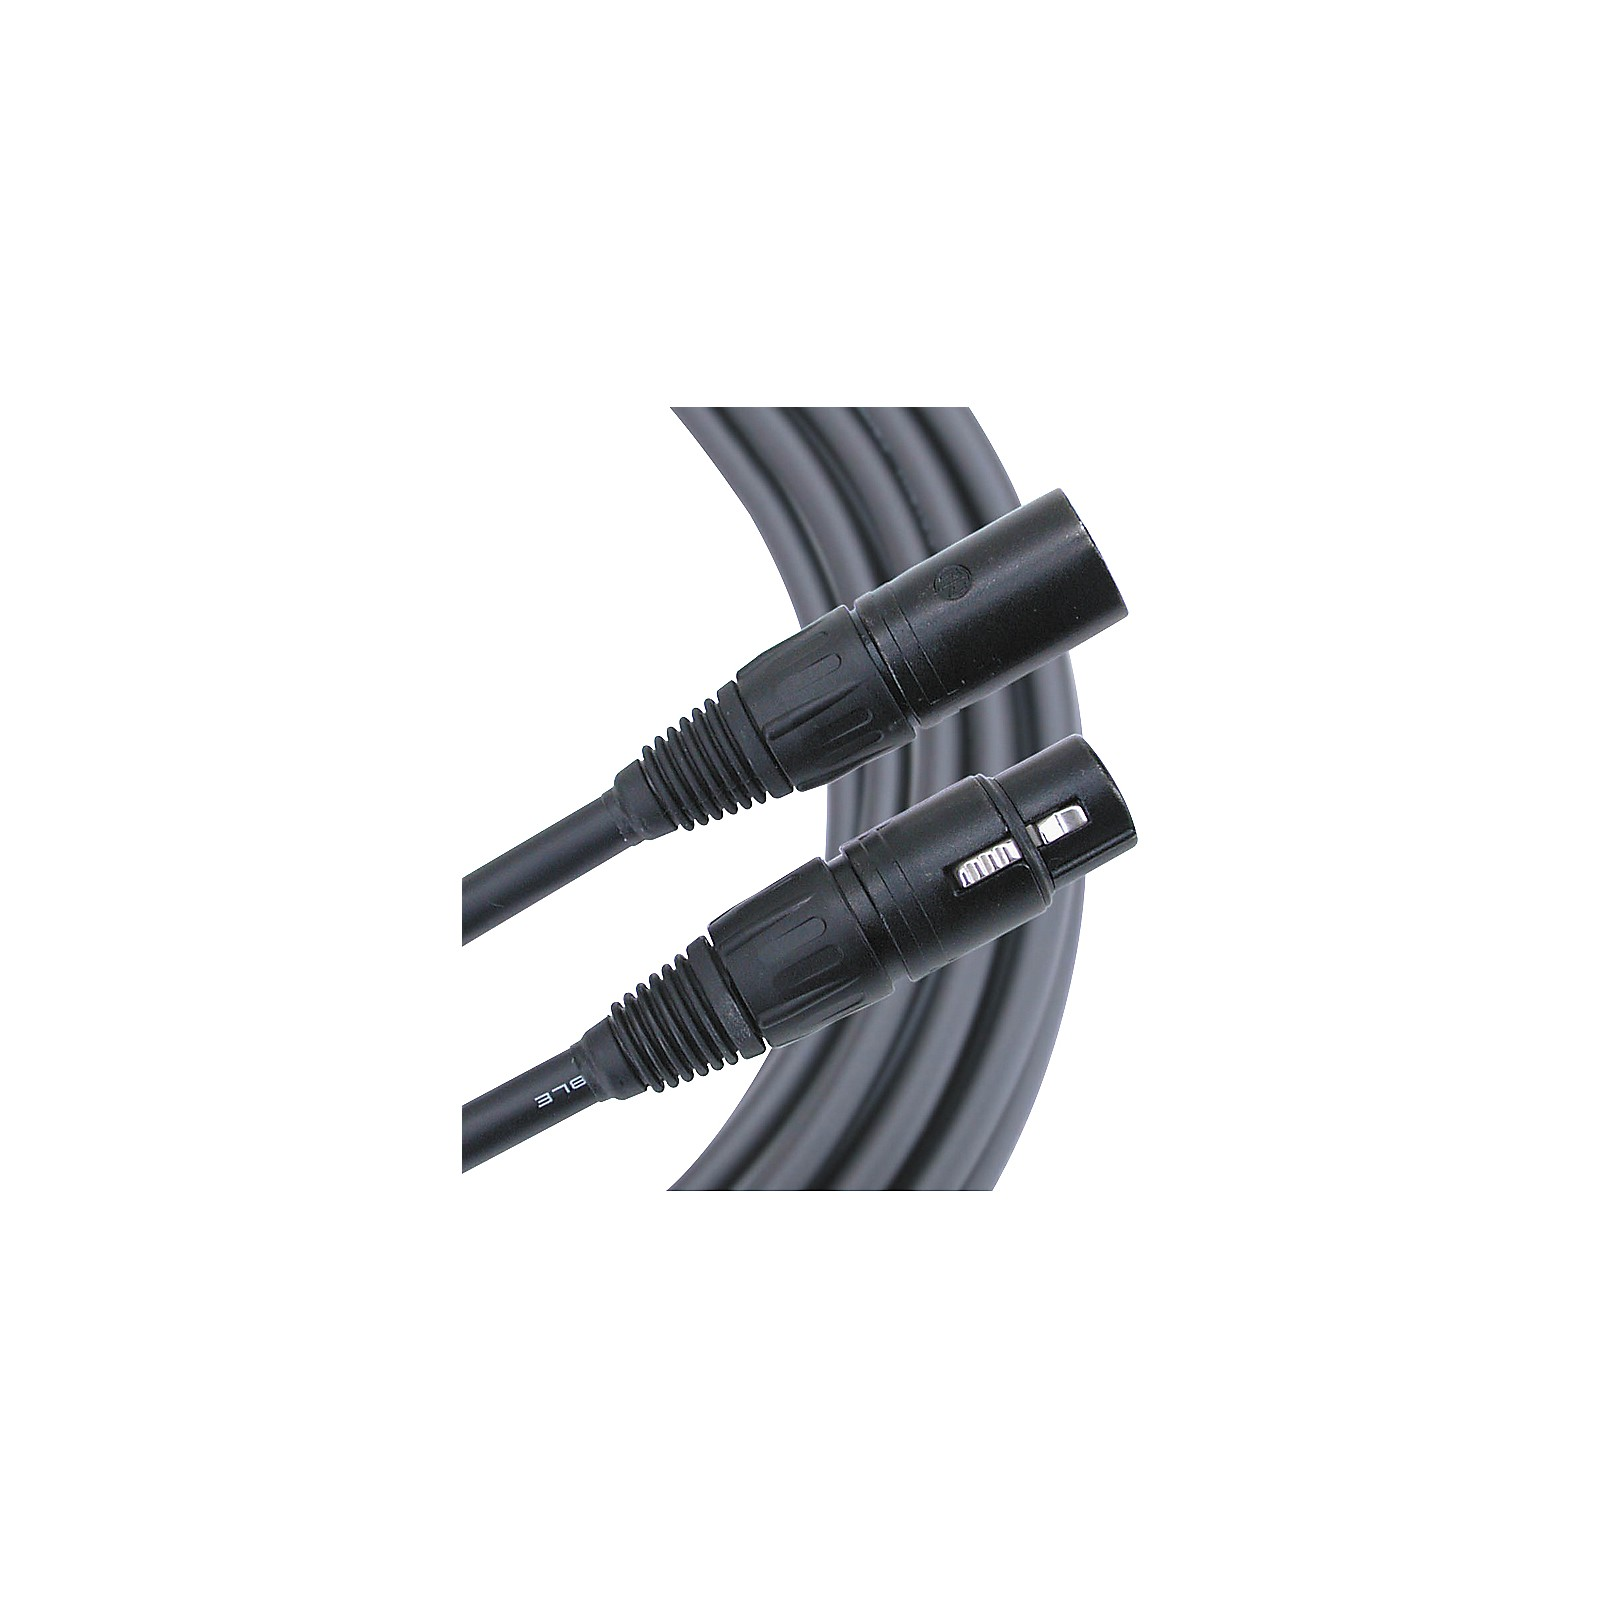 Mogami Gold AES/EBU Interconnect Cable with Neutrik XLR